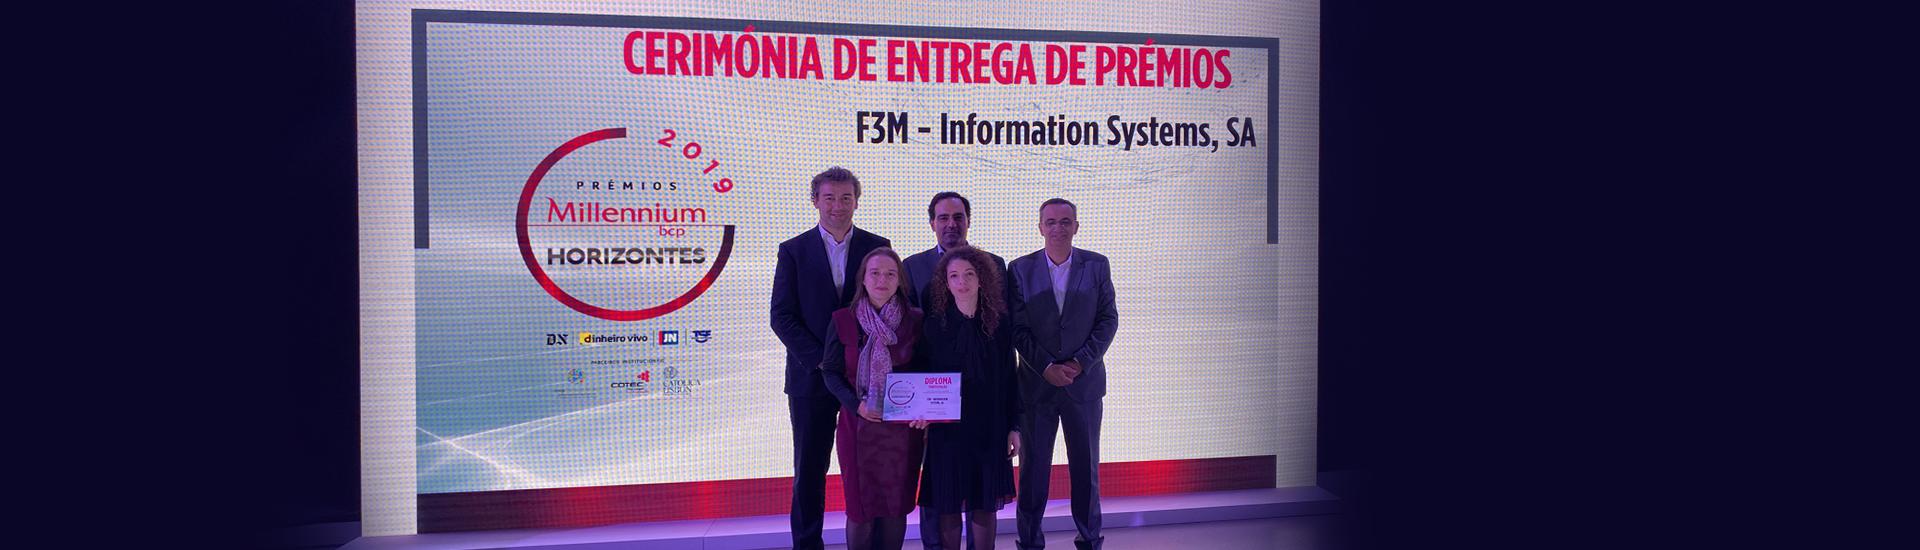 Prémios Millennium Horizontes| F3M entre as Empresas Finalistas